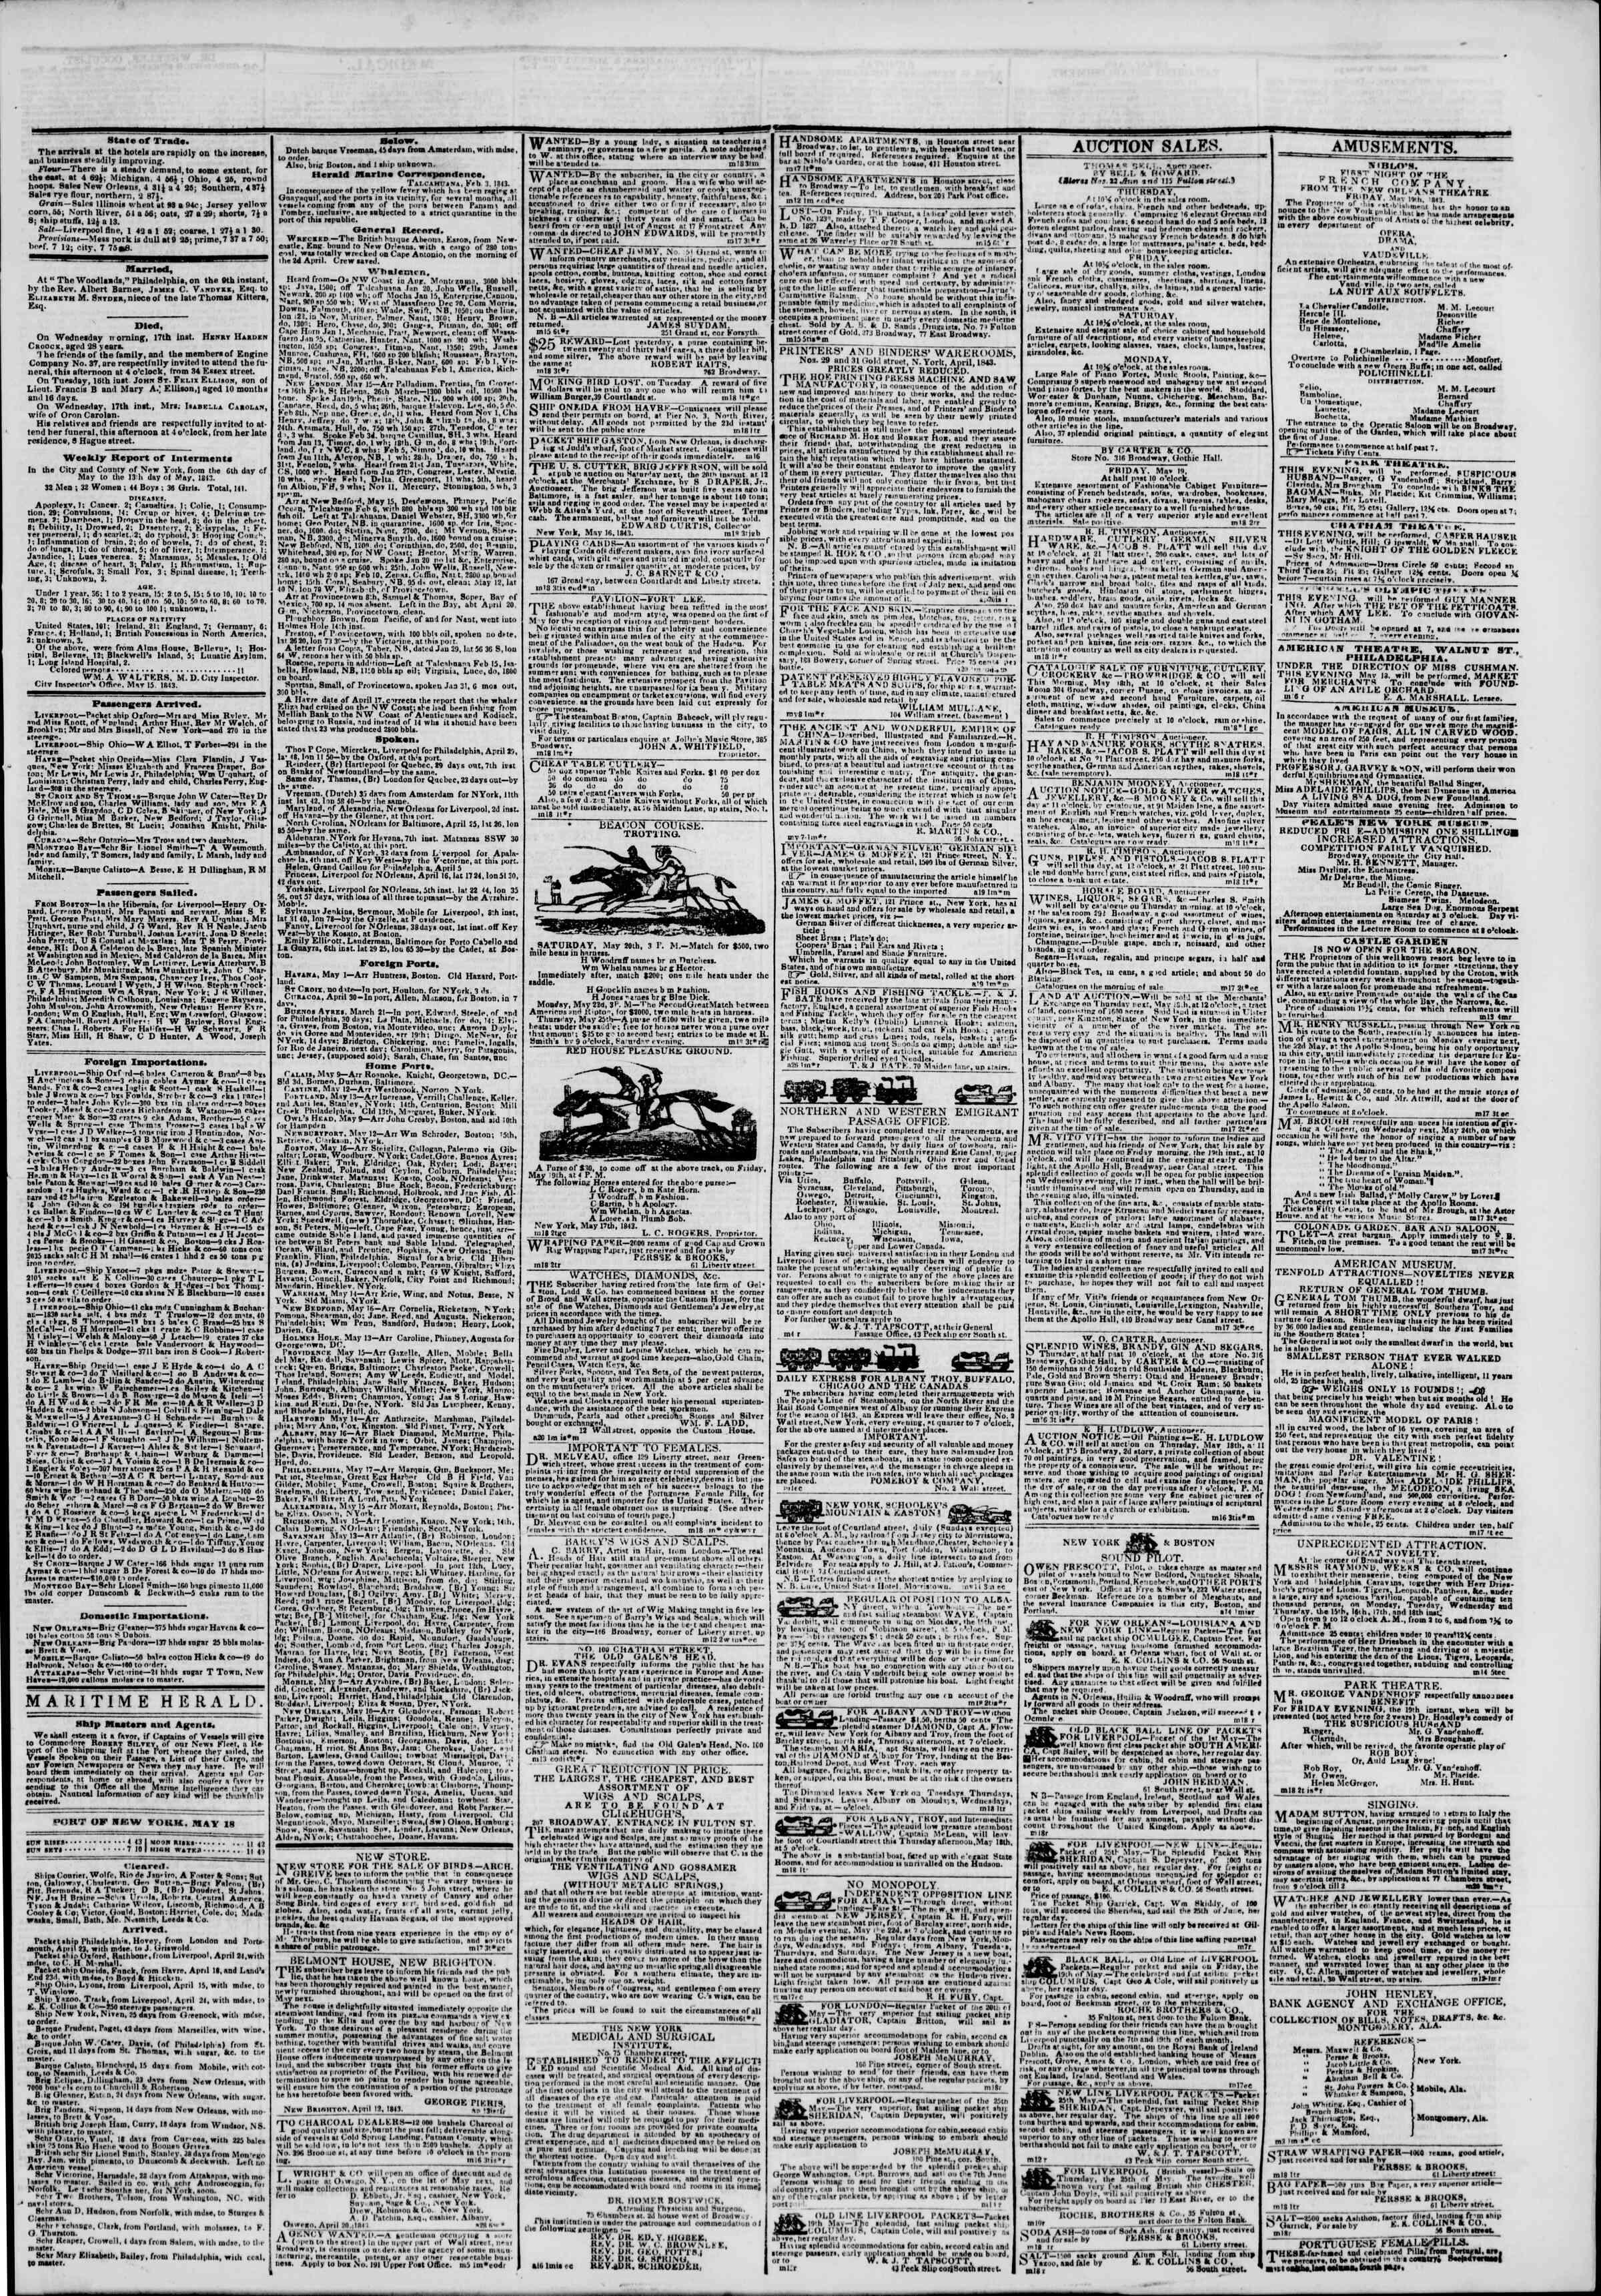 May 18, 1843 Tarihli The New York Herald Gazetesi Sayfa 3